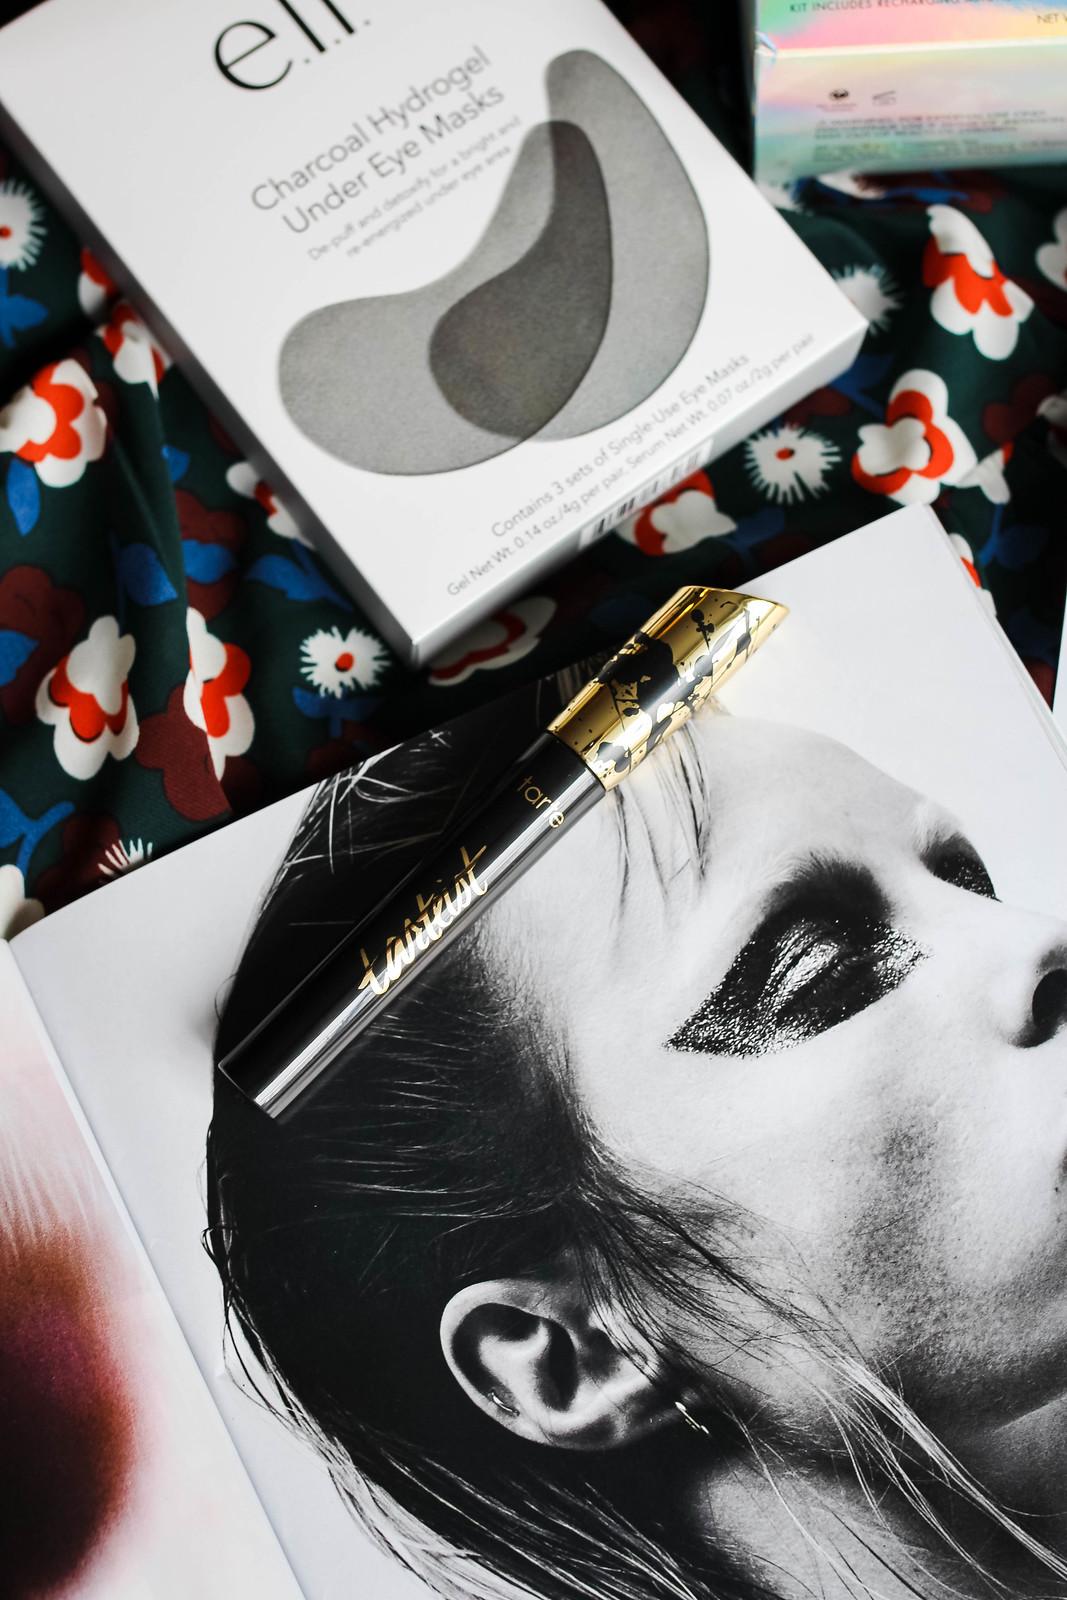 Tarte Tarteist Lash Paint Mascara Flat Lay Black White Magazine